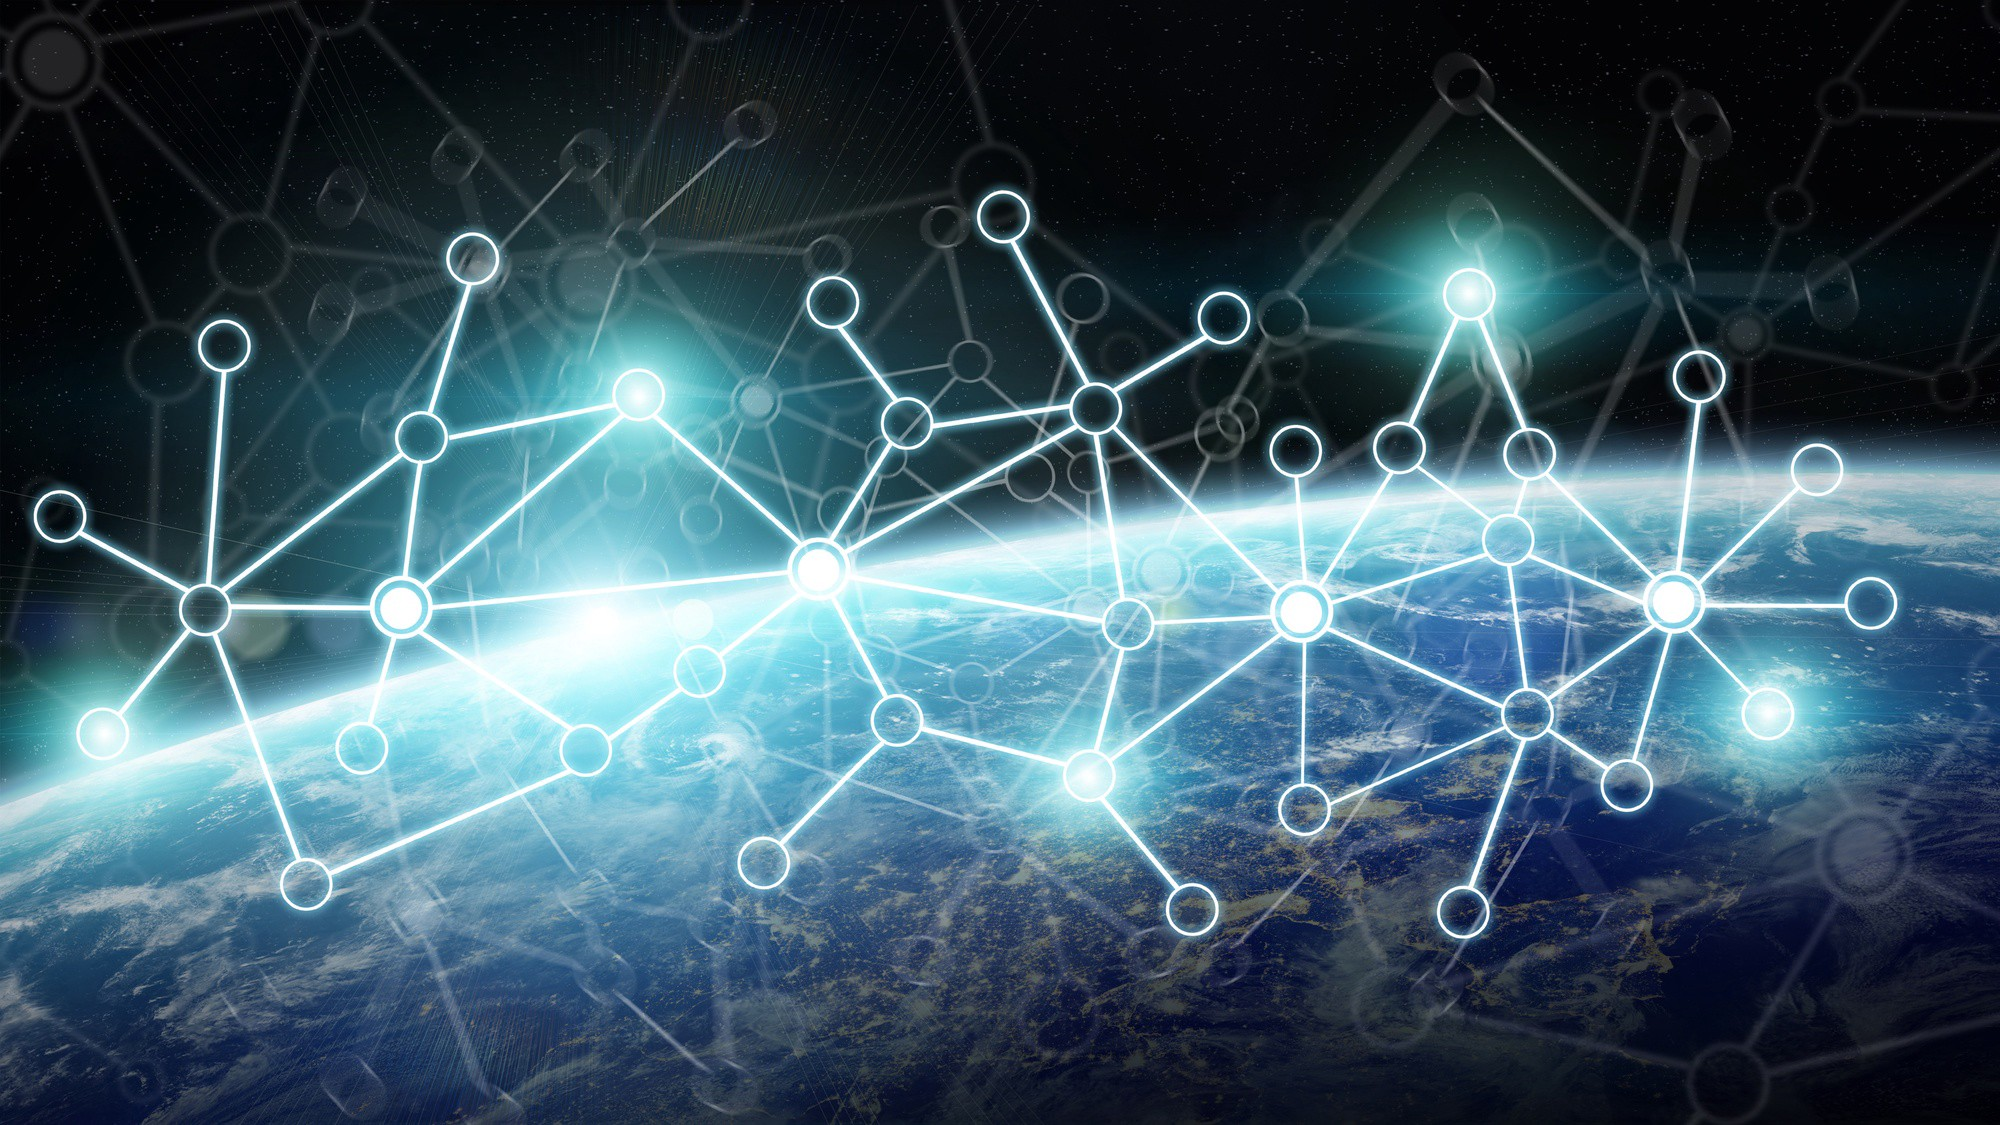 Bitcoin lightening network